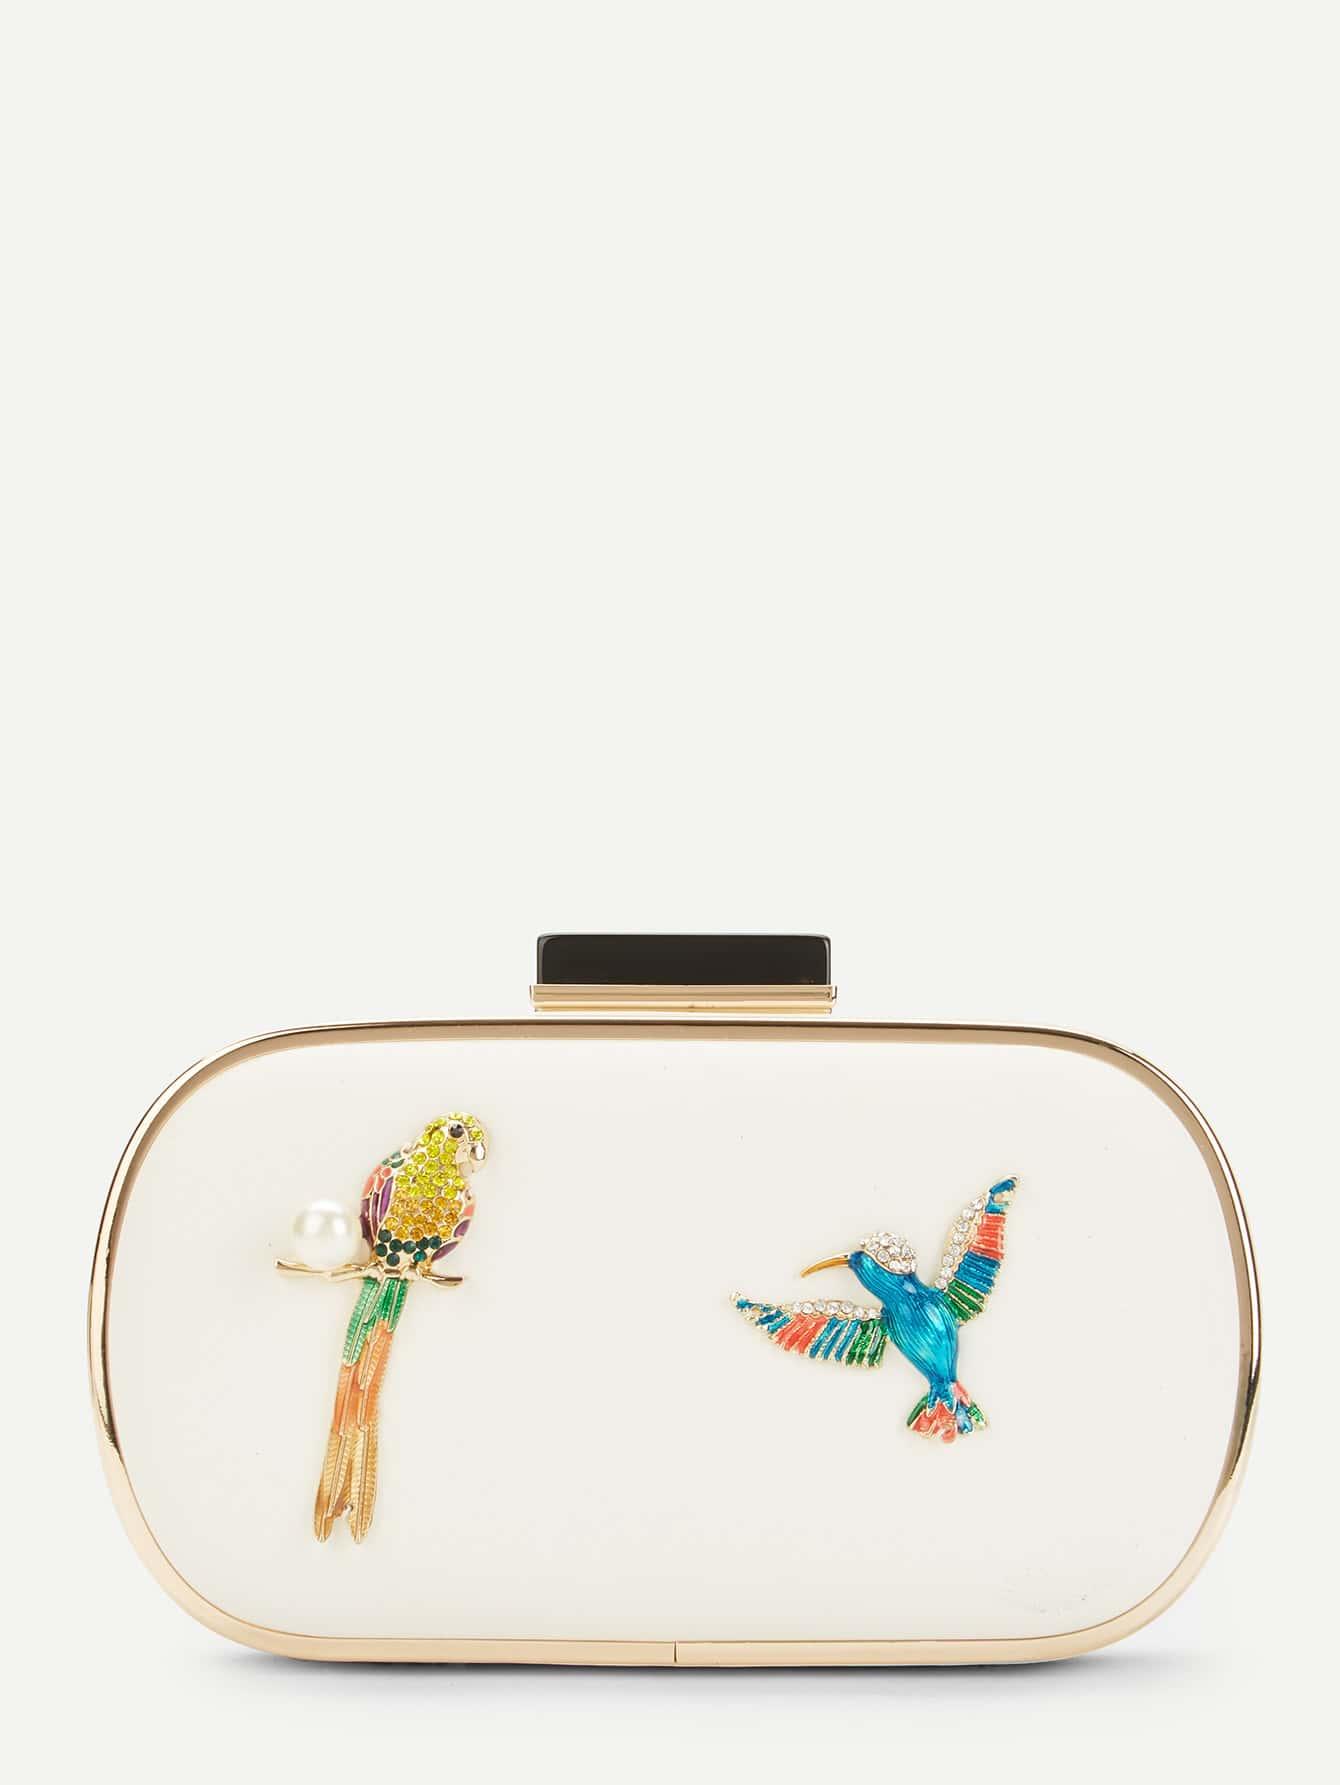 Фото - Bird Pattern Clutch Chain Bag fawziya bird clutch bags for womens evening bag hard case rhinestone